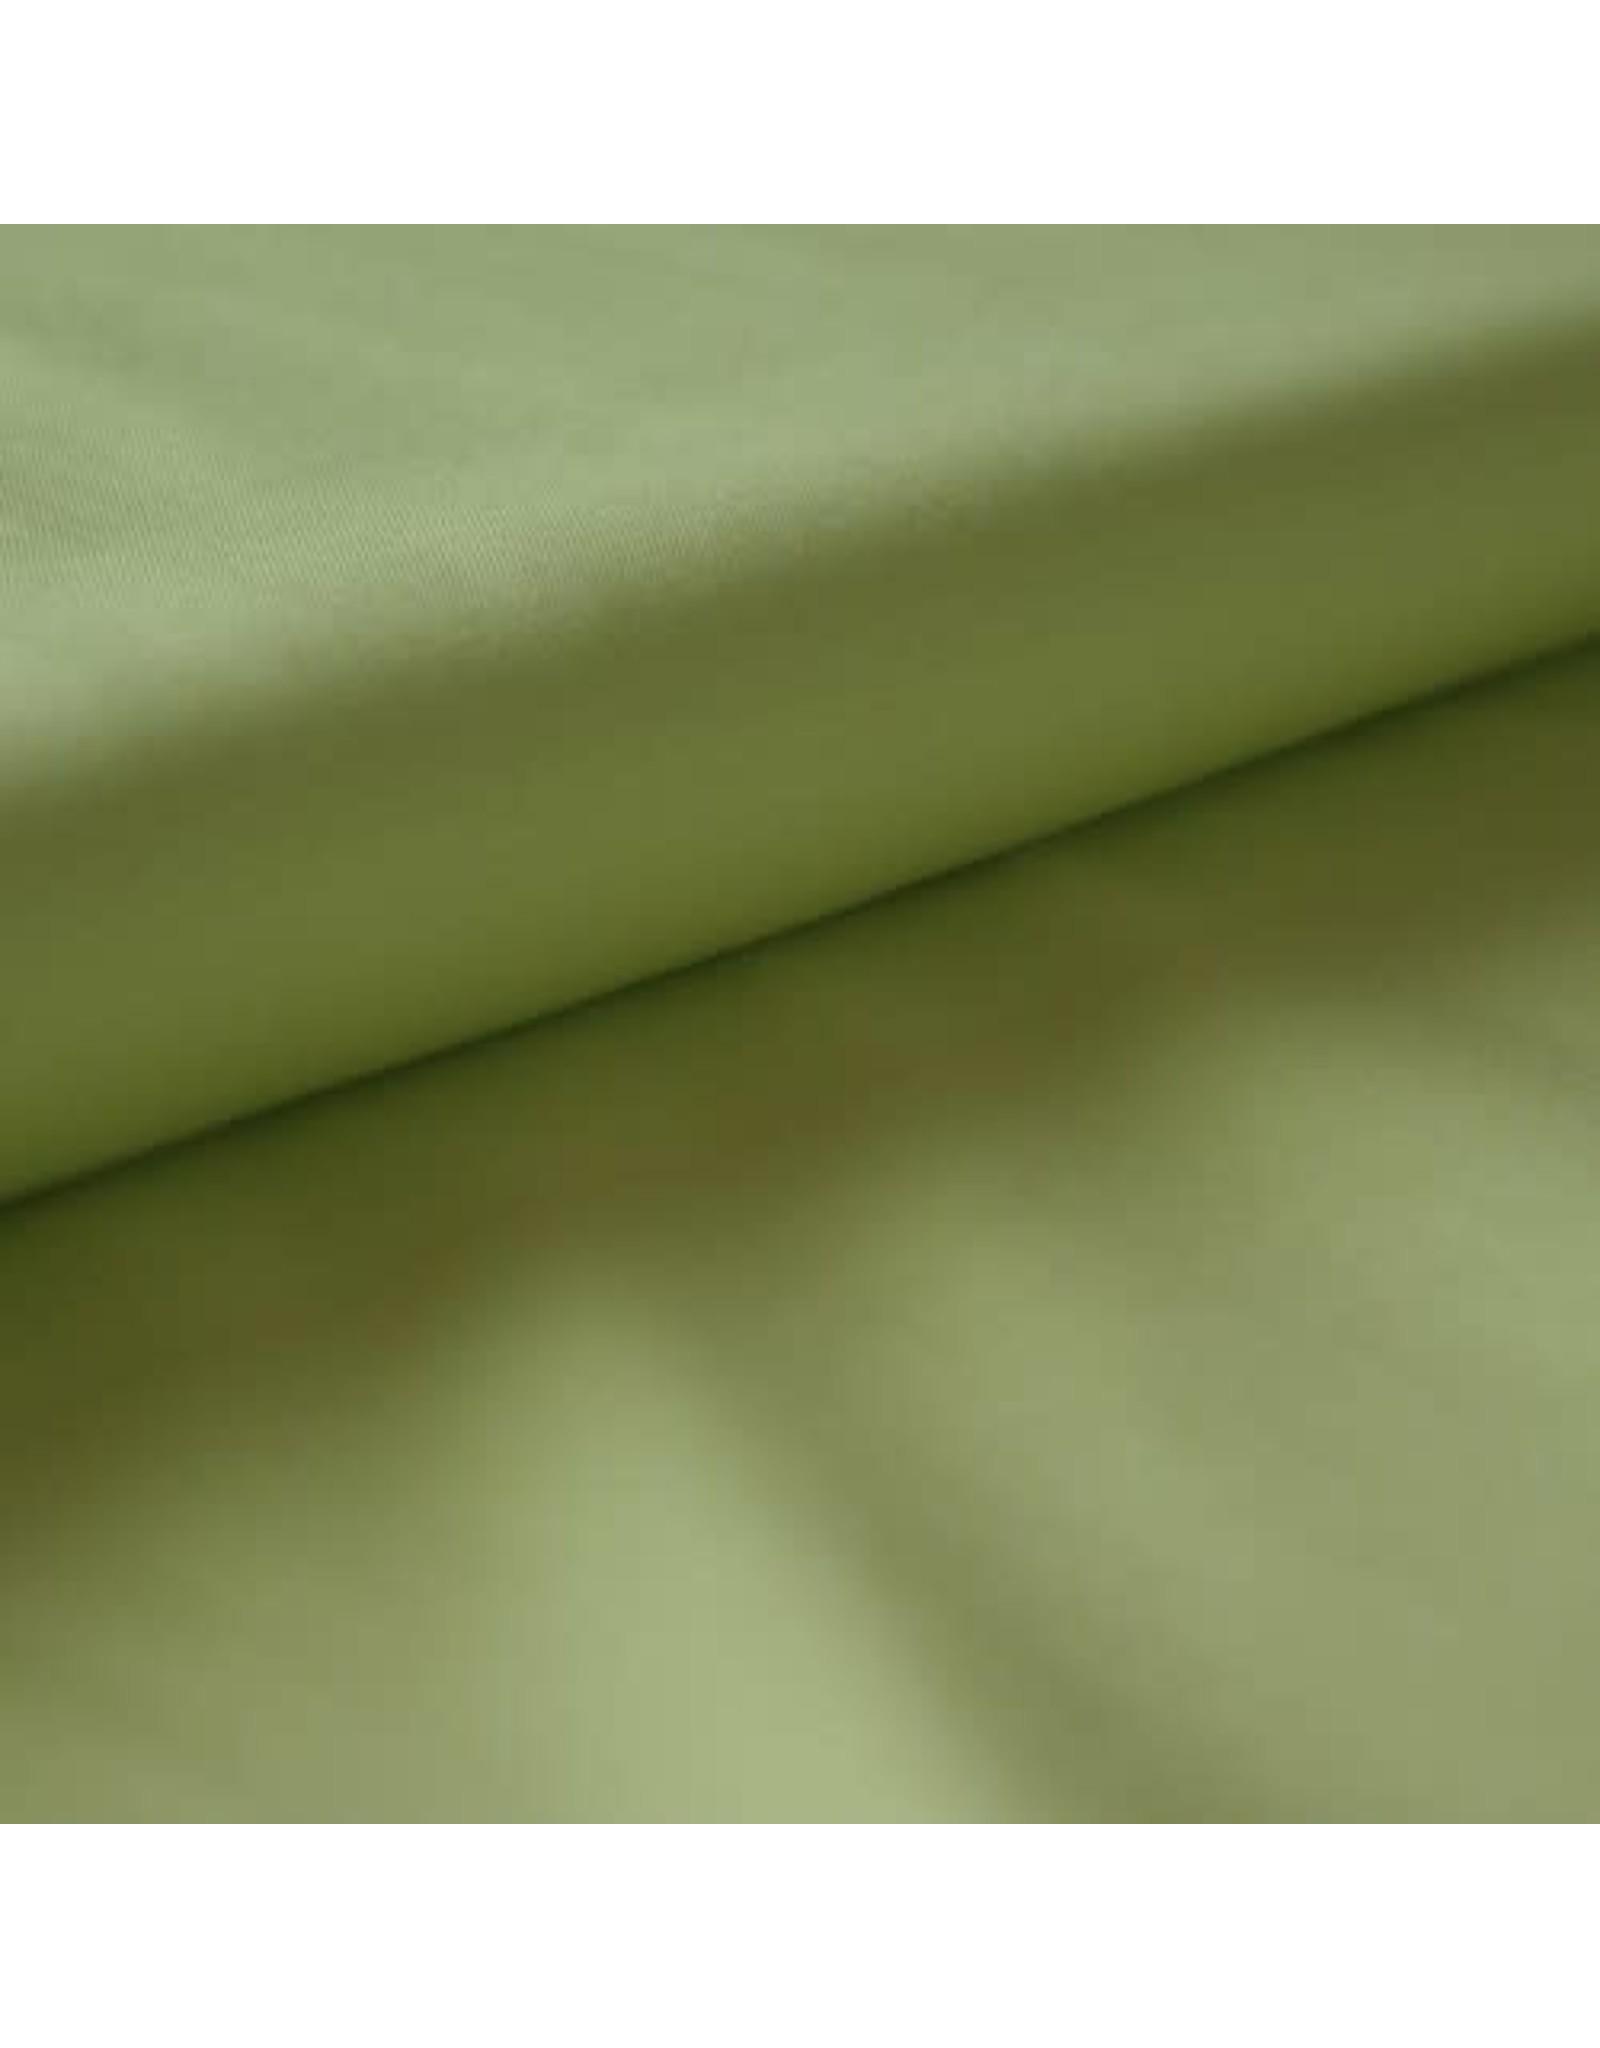 Anbo textile Cactus